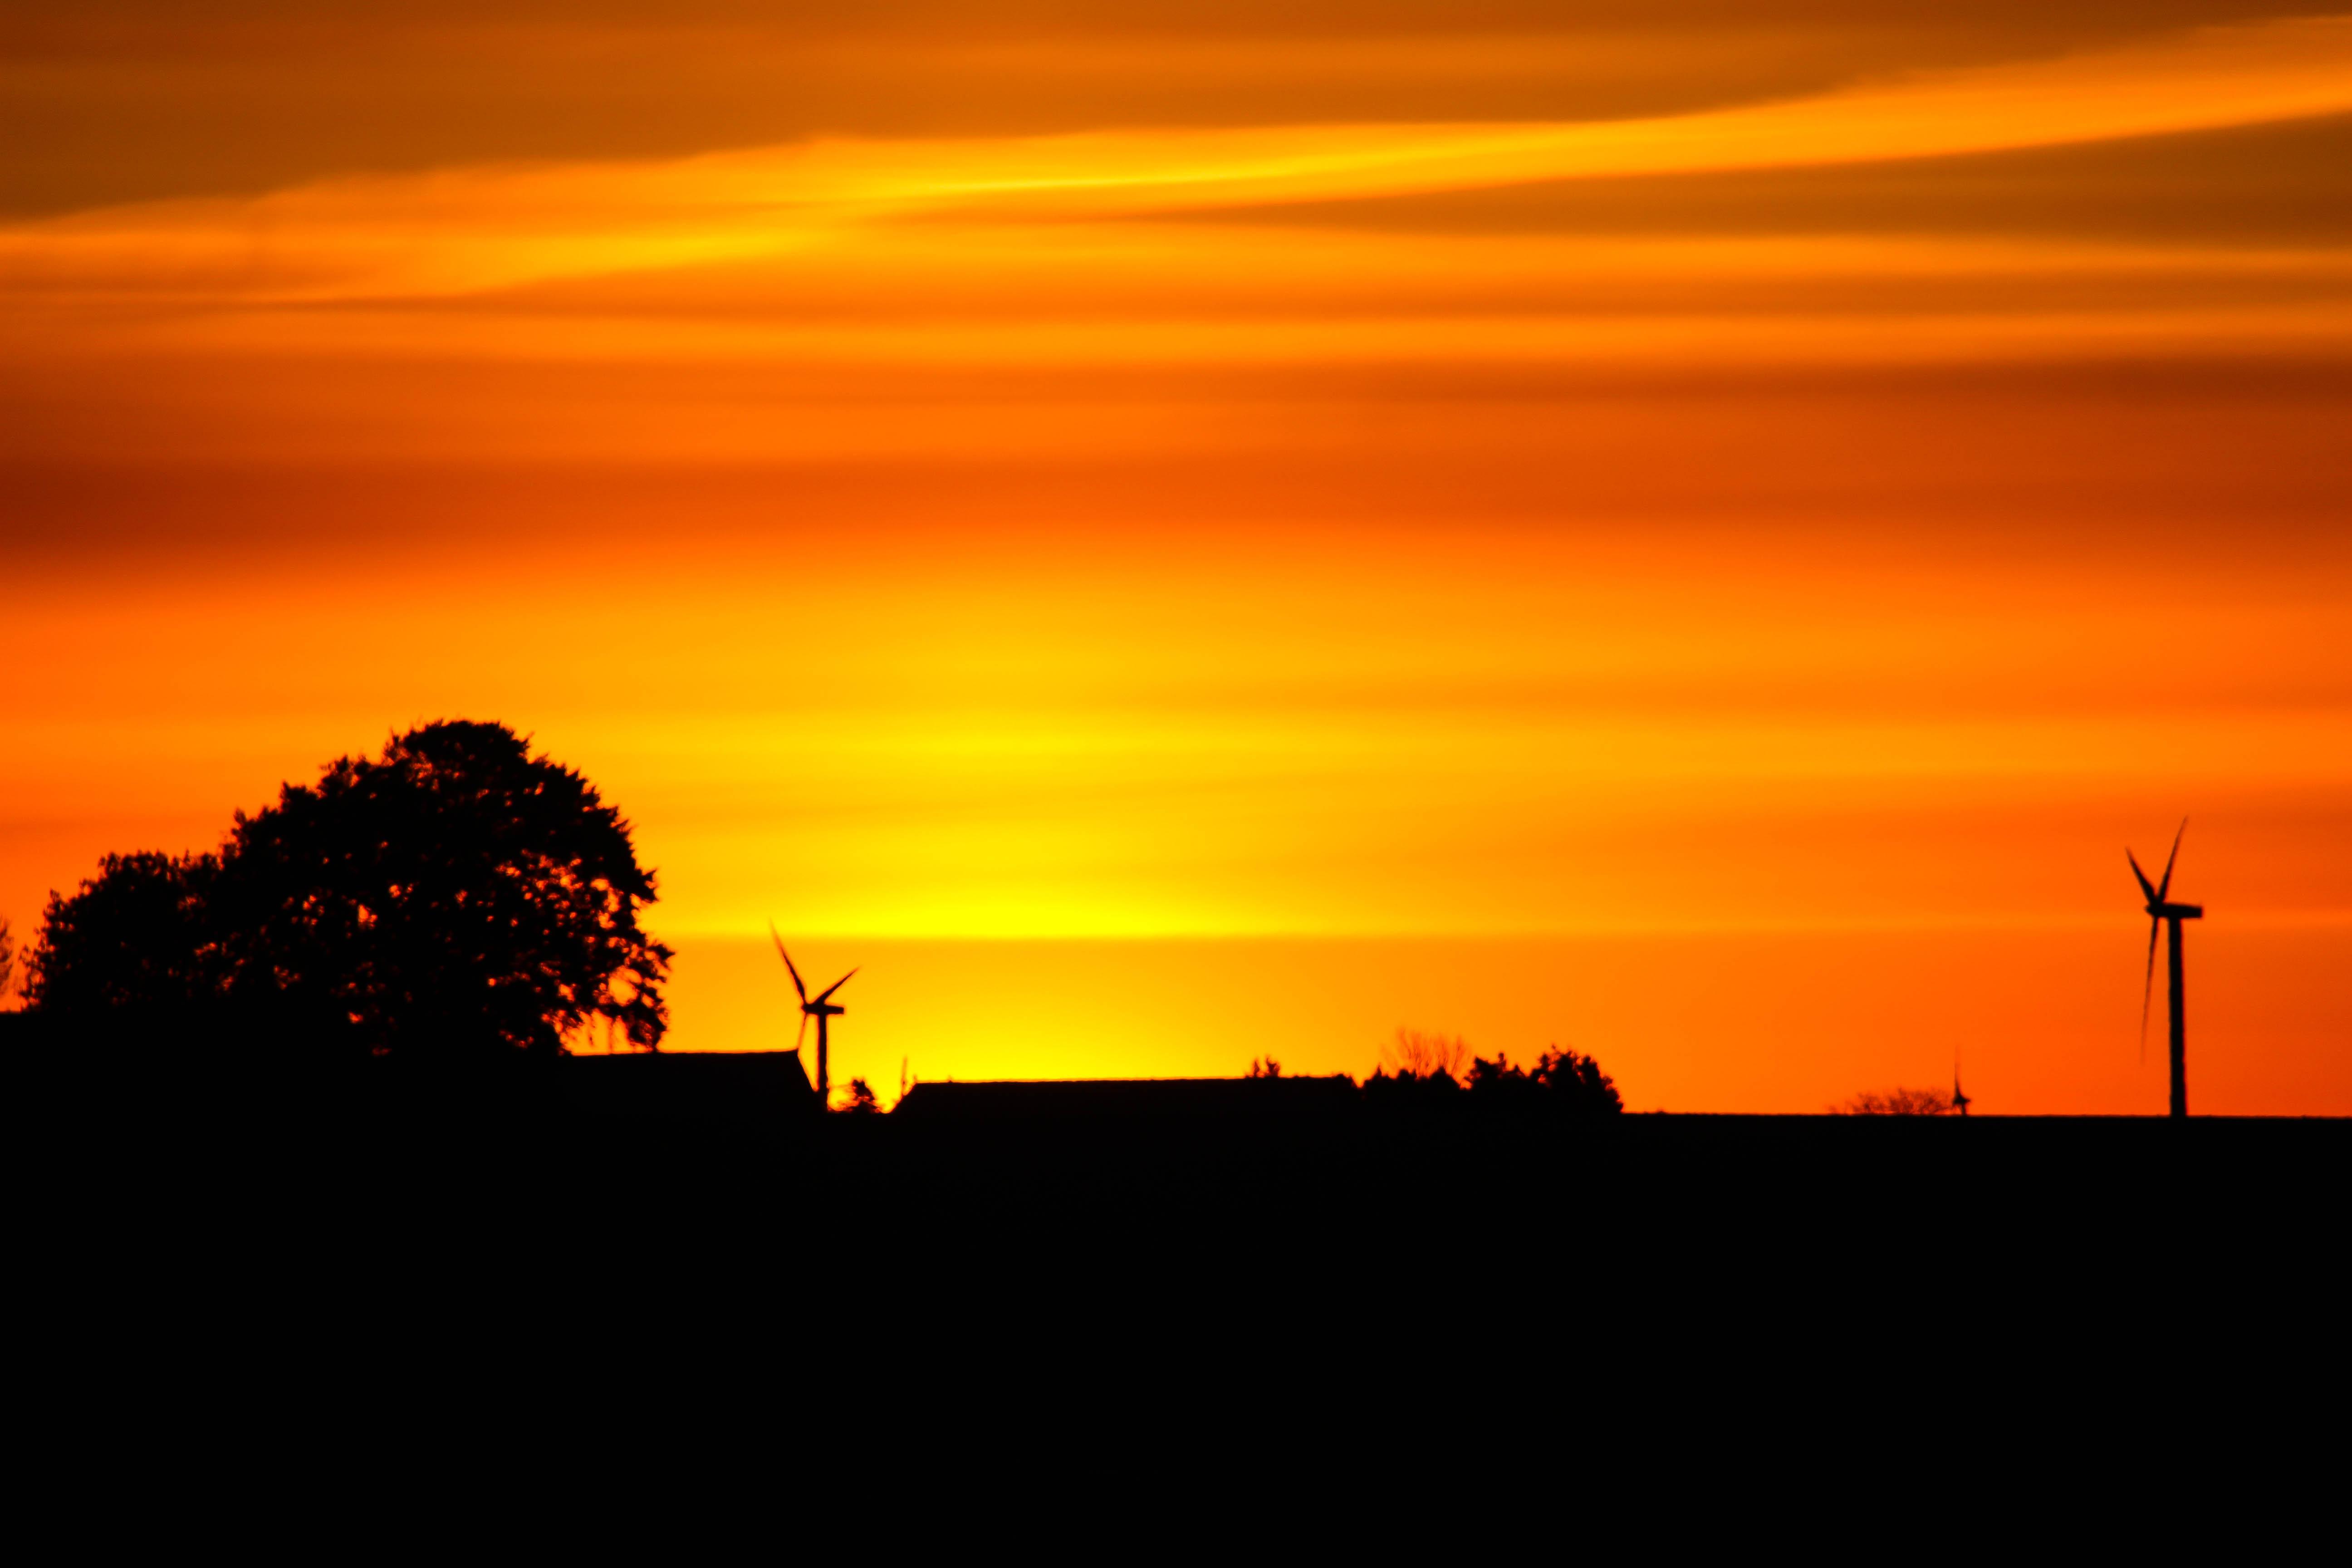 sunlight landscape sunset sky field silhouette sunrise yellow evening morning Sun orange horizon atmosphere dusk cloud tree dawn himmel gul landskap gryning llandscape soderslatt computer wallpaper atmosphere of earth afterglow red sky at morning ecoregion 845281